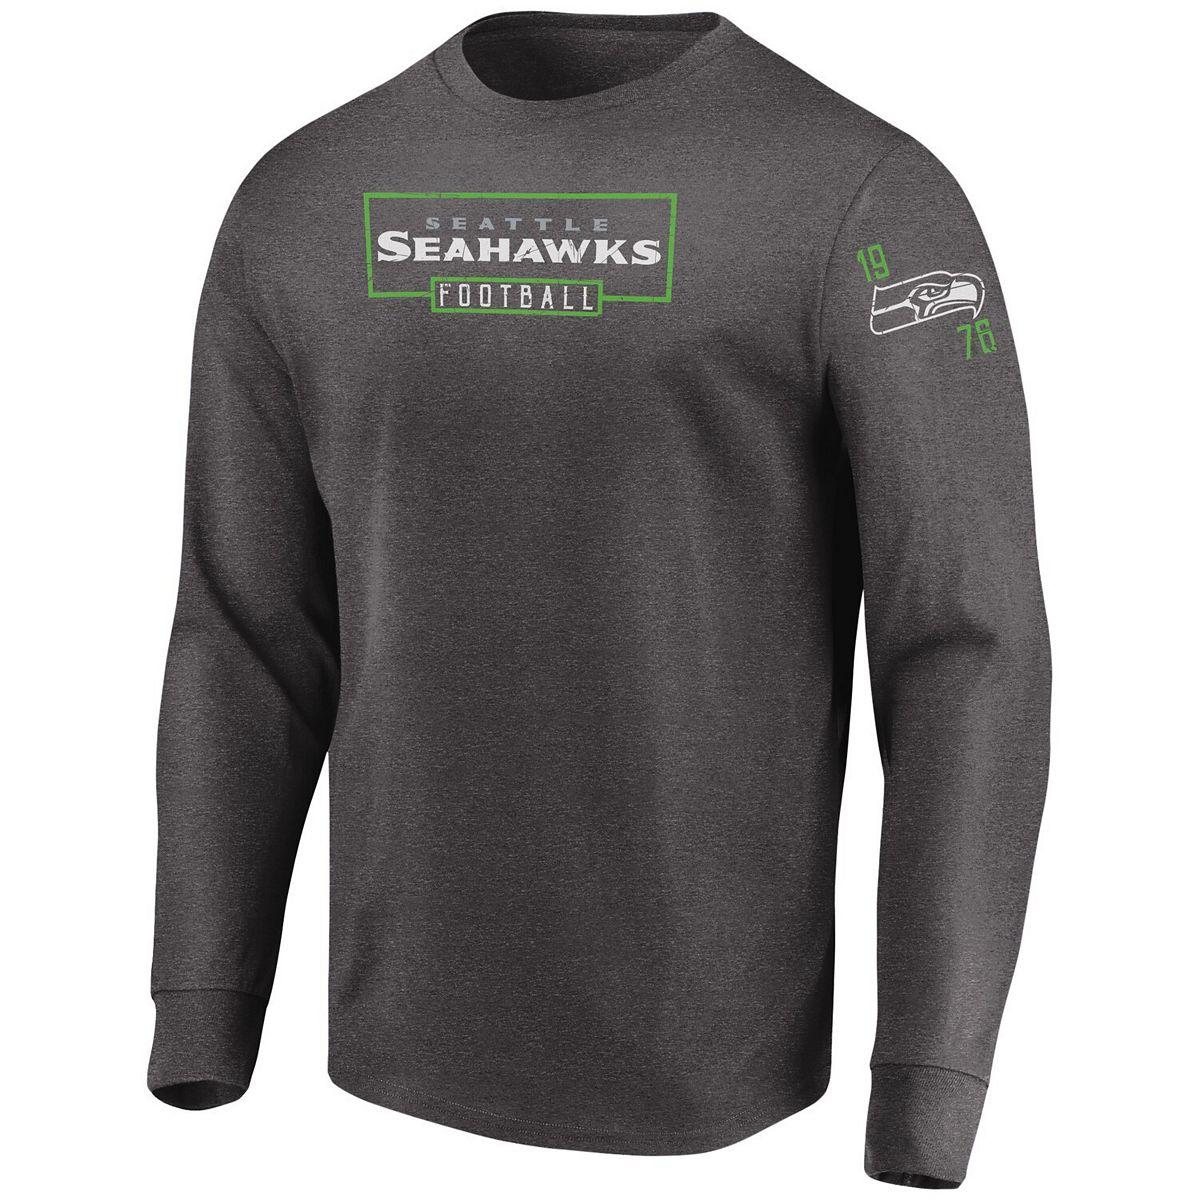 Men's Majestic Heathered Charcoal Seattle Seahawks Big & Tall Kick Return Long Sleeve T-Shirt cZCeZ